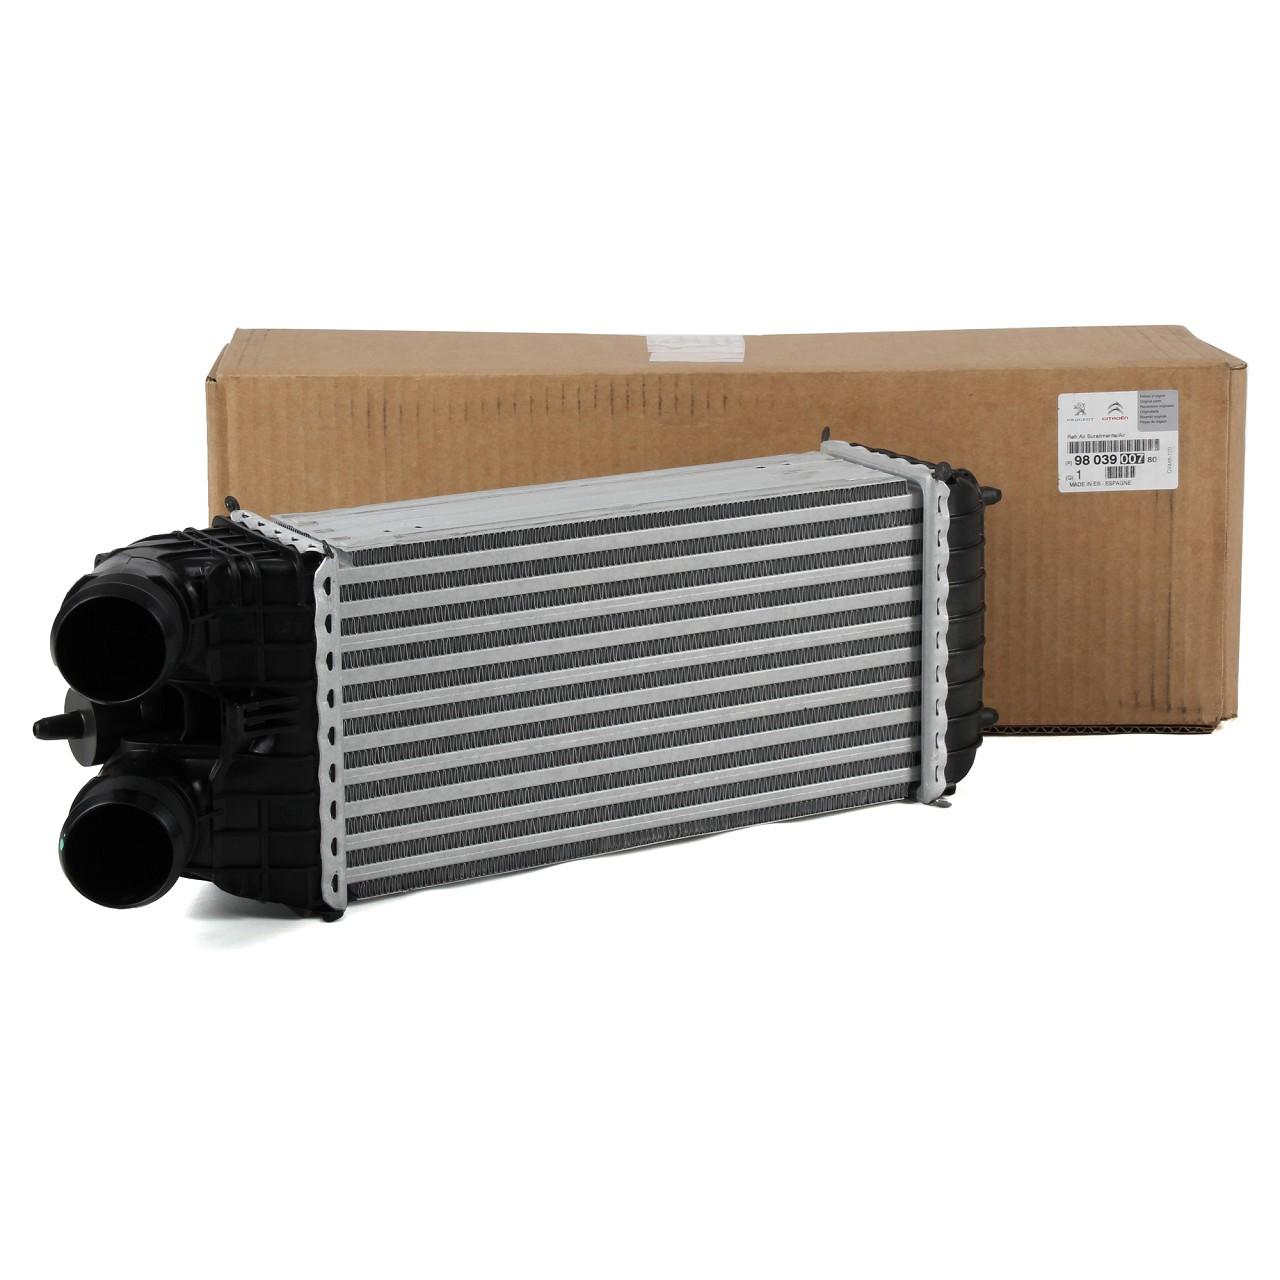 ORIGINAL Citroen Peugeot Ladeluftkühler Turbokühler Intercooler LLK 9803900780